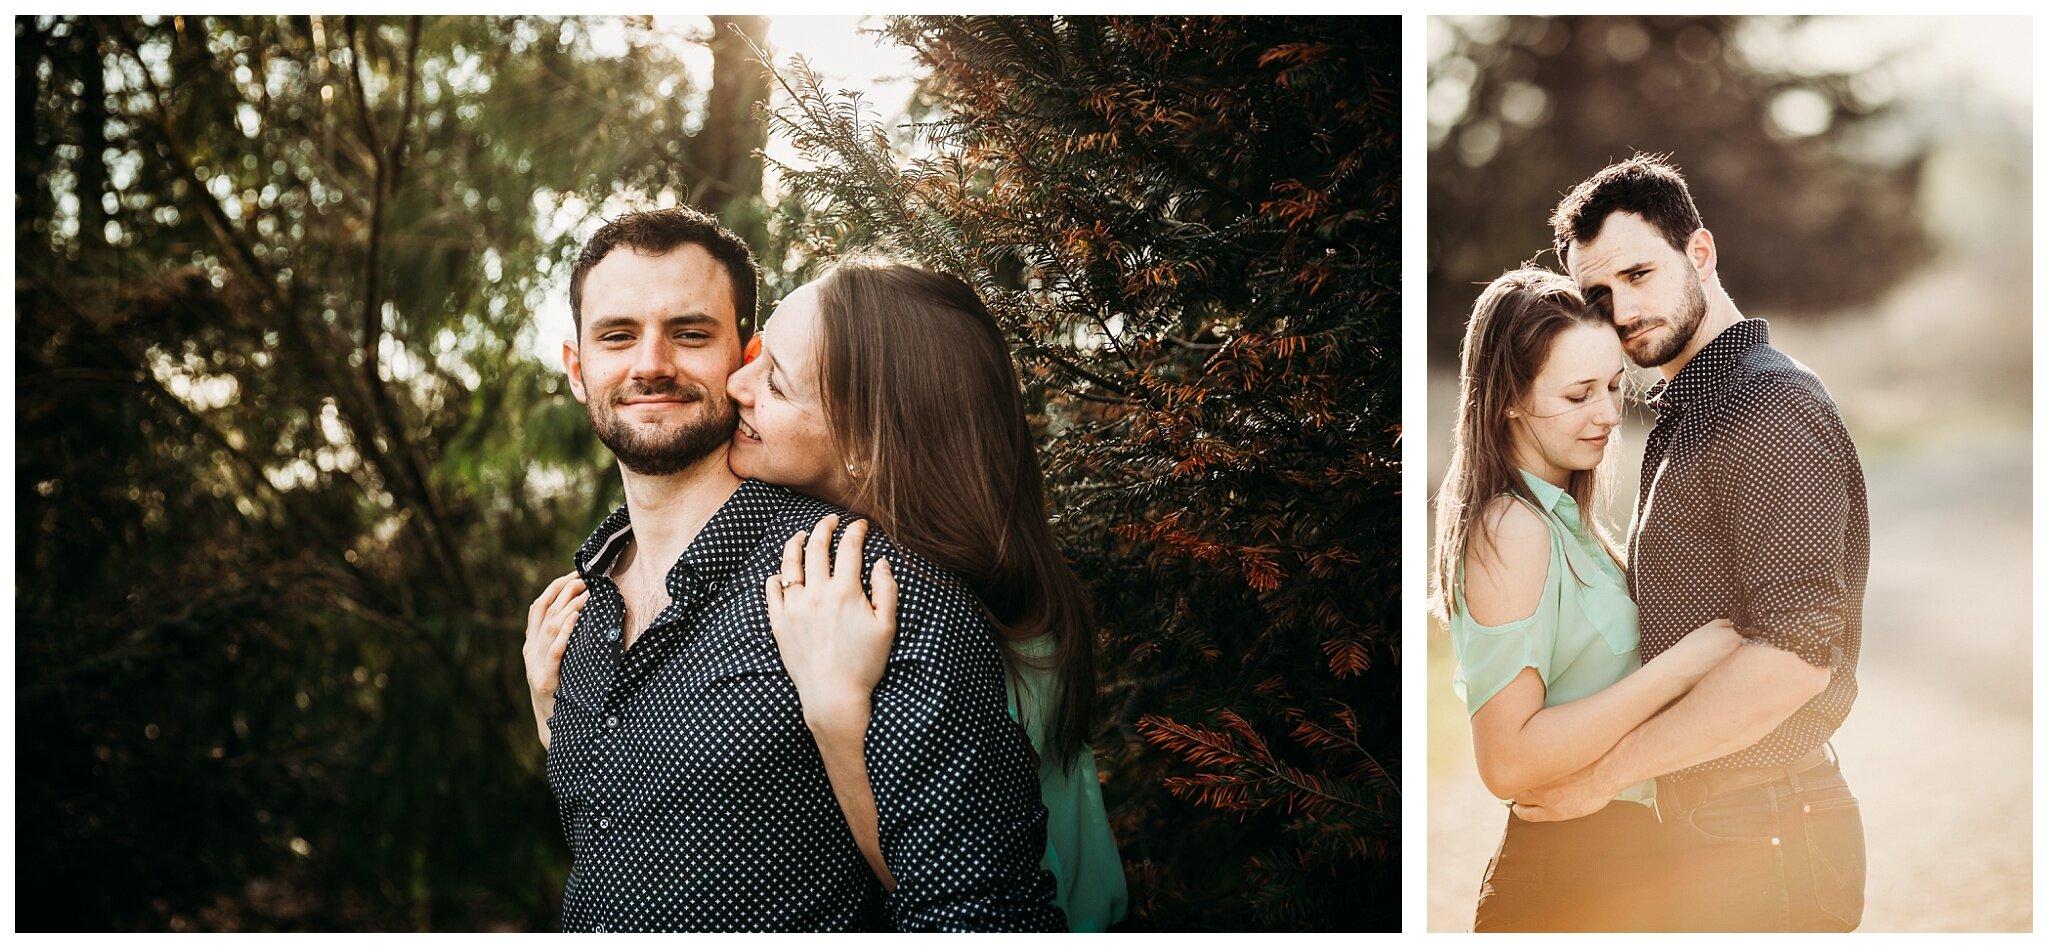 Willband Creek Park Abbotsford Engagement Photographer_0019.jpg